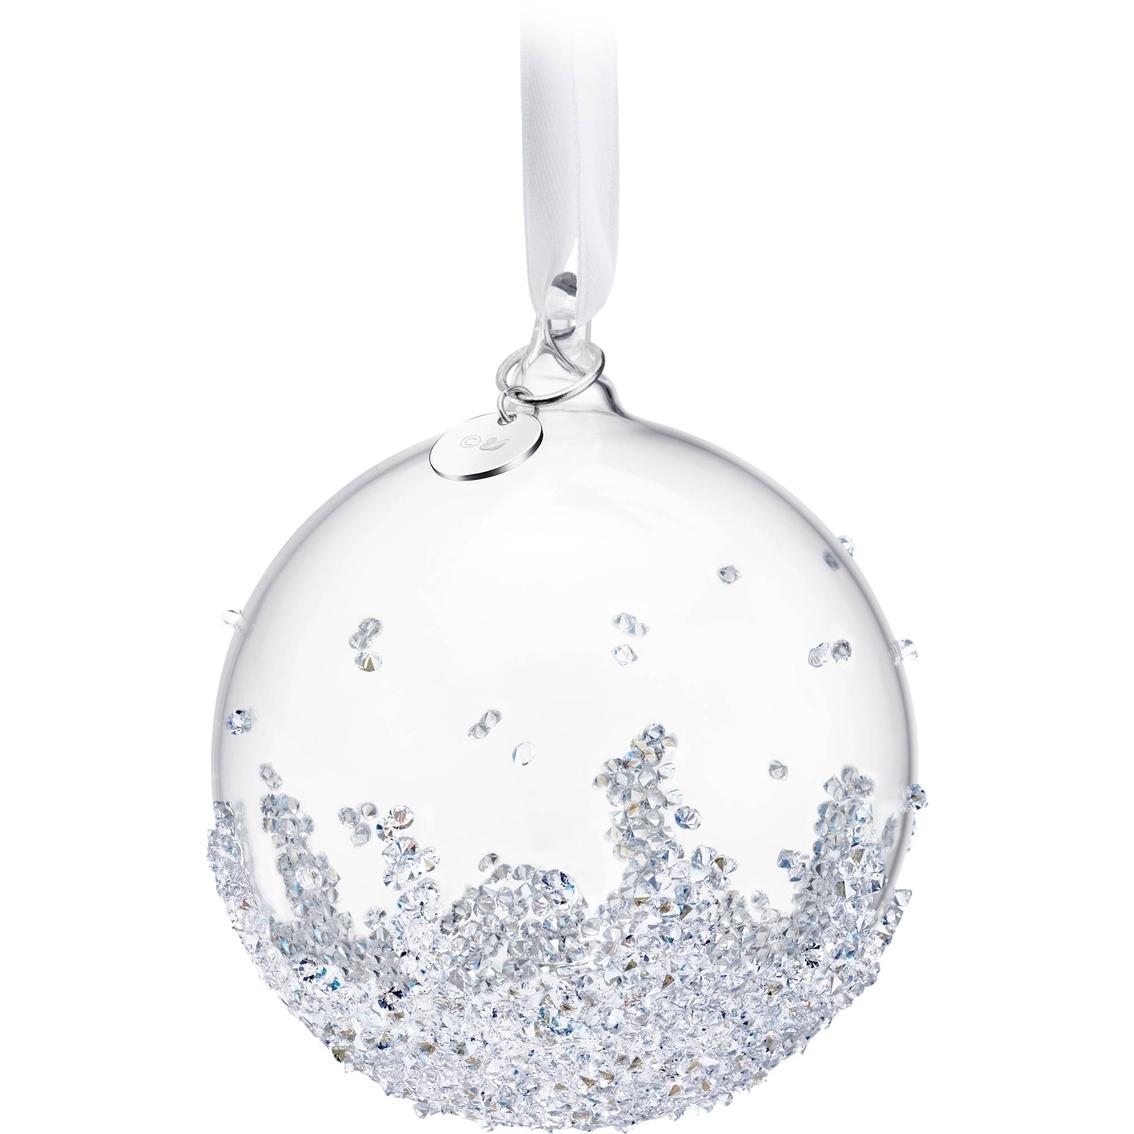 Swarovski Christmas Ball Ornament, Small | Ornaments ...